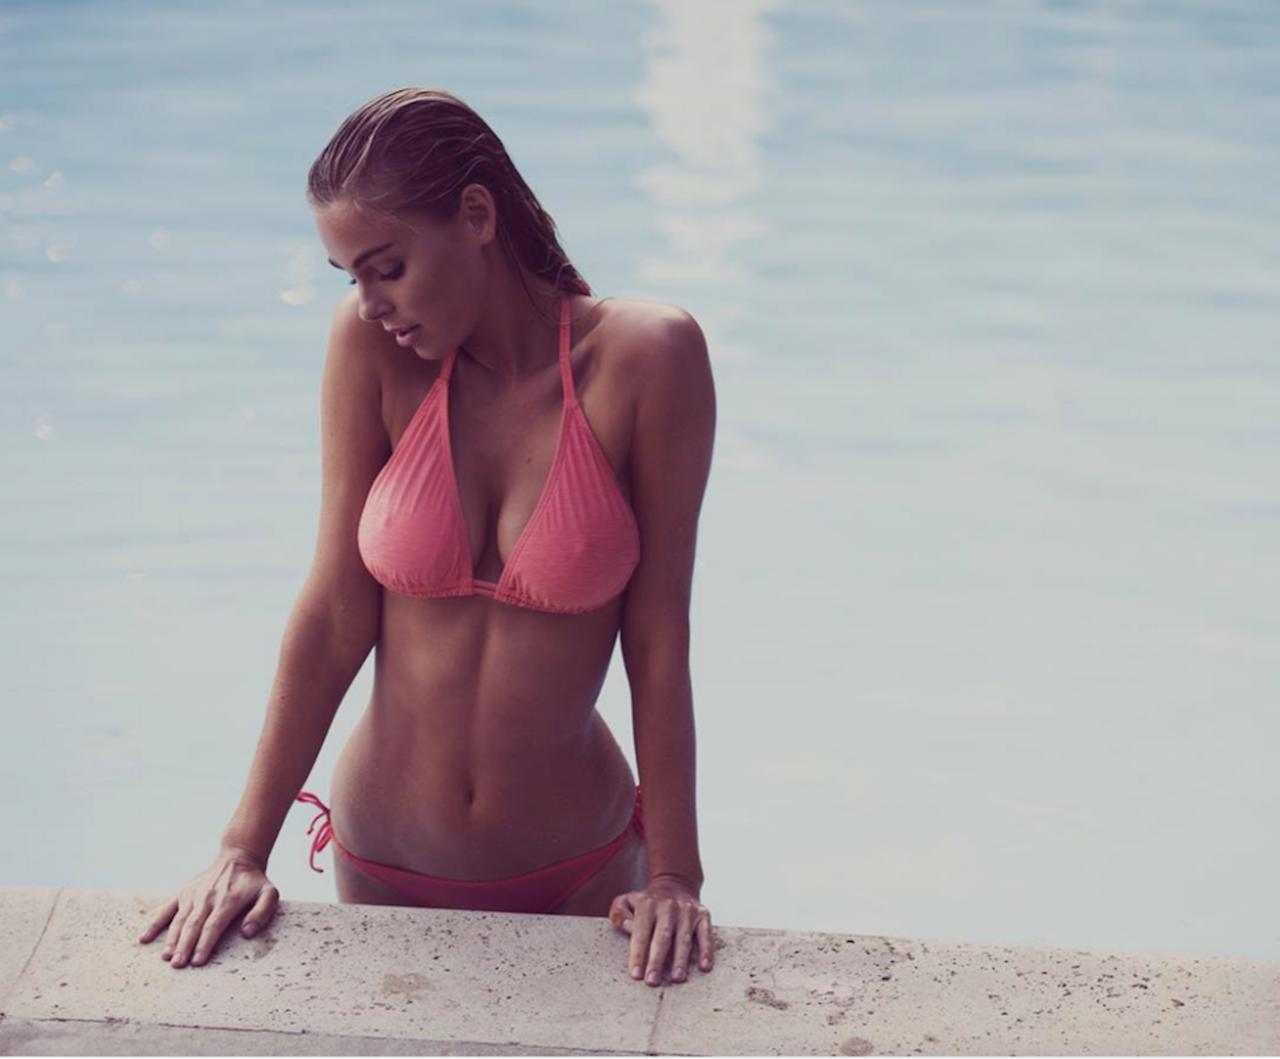 ICloud Elizabeth Turner nudes (56 photos), Sexy, Paparazzi, Twitter, braless 2018